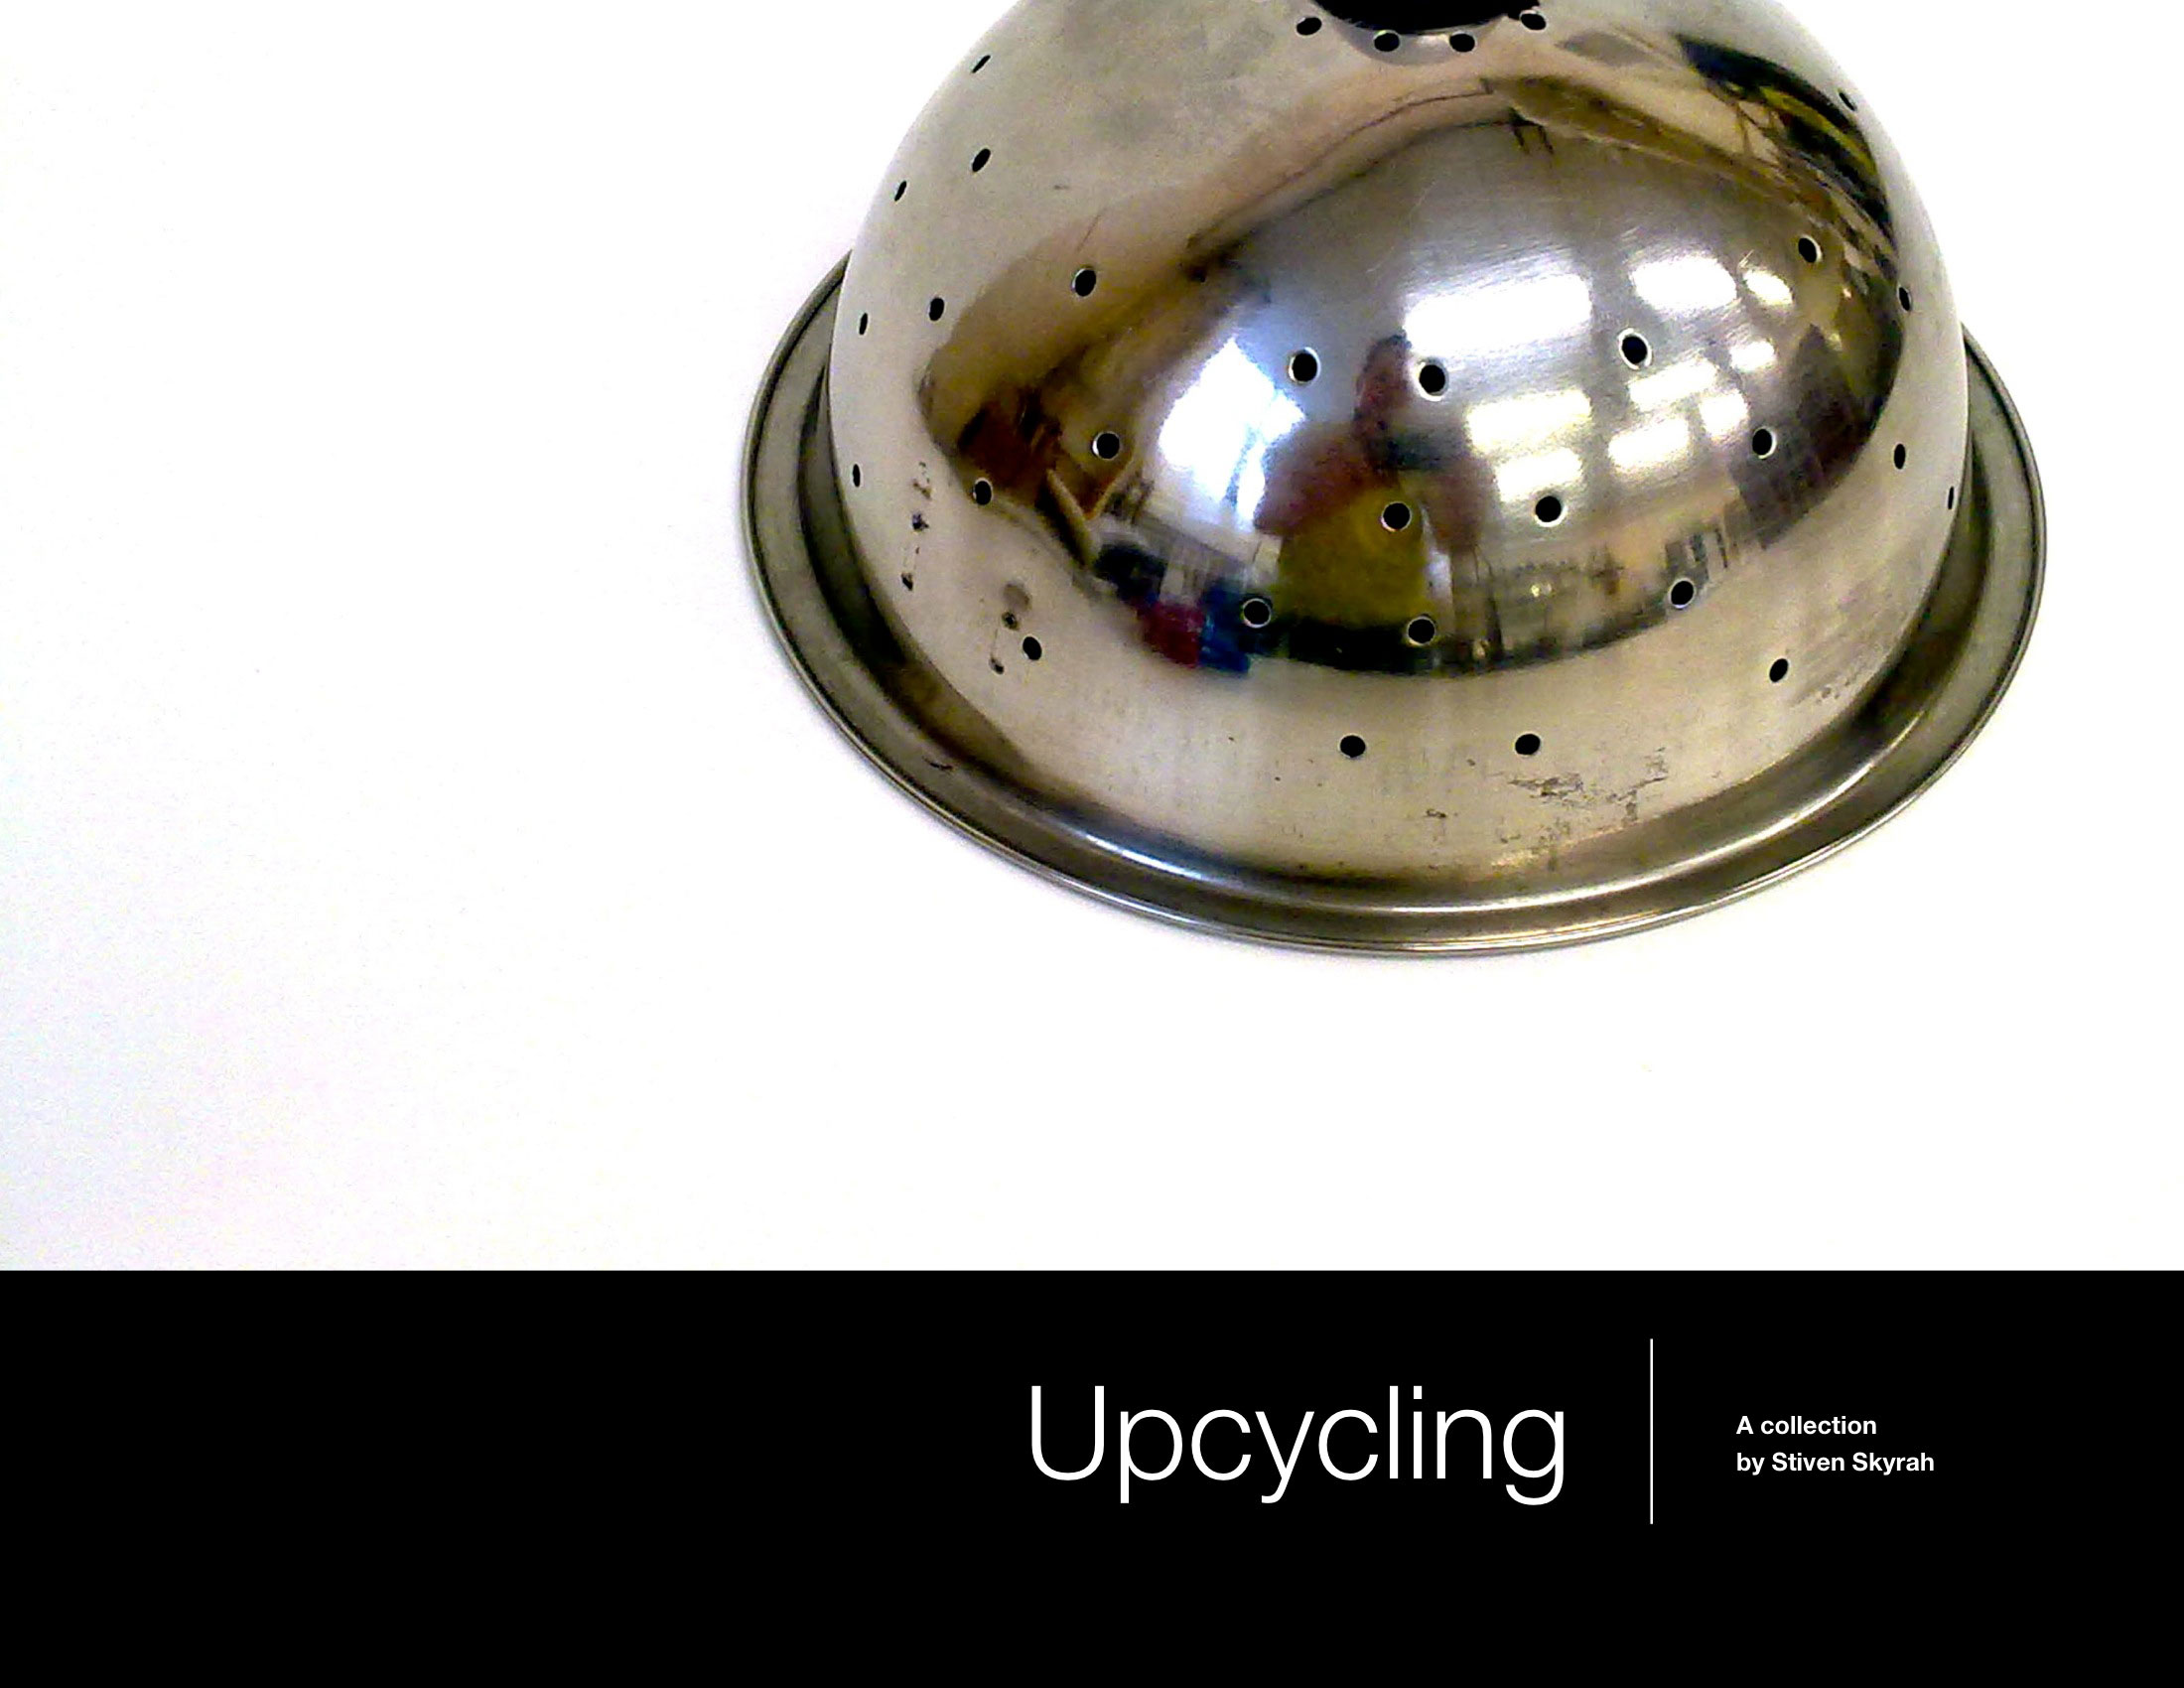 01-Upcycling-Designwithlove-stivenskyrah